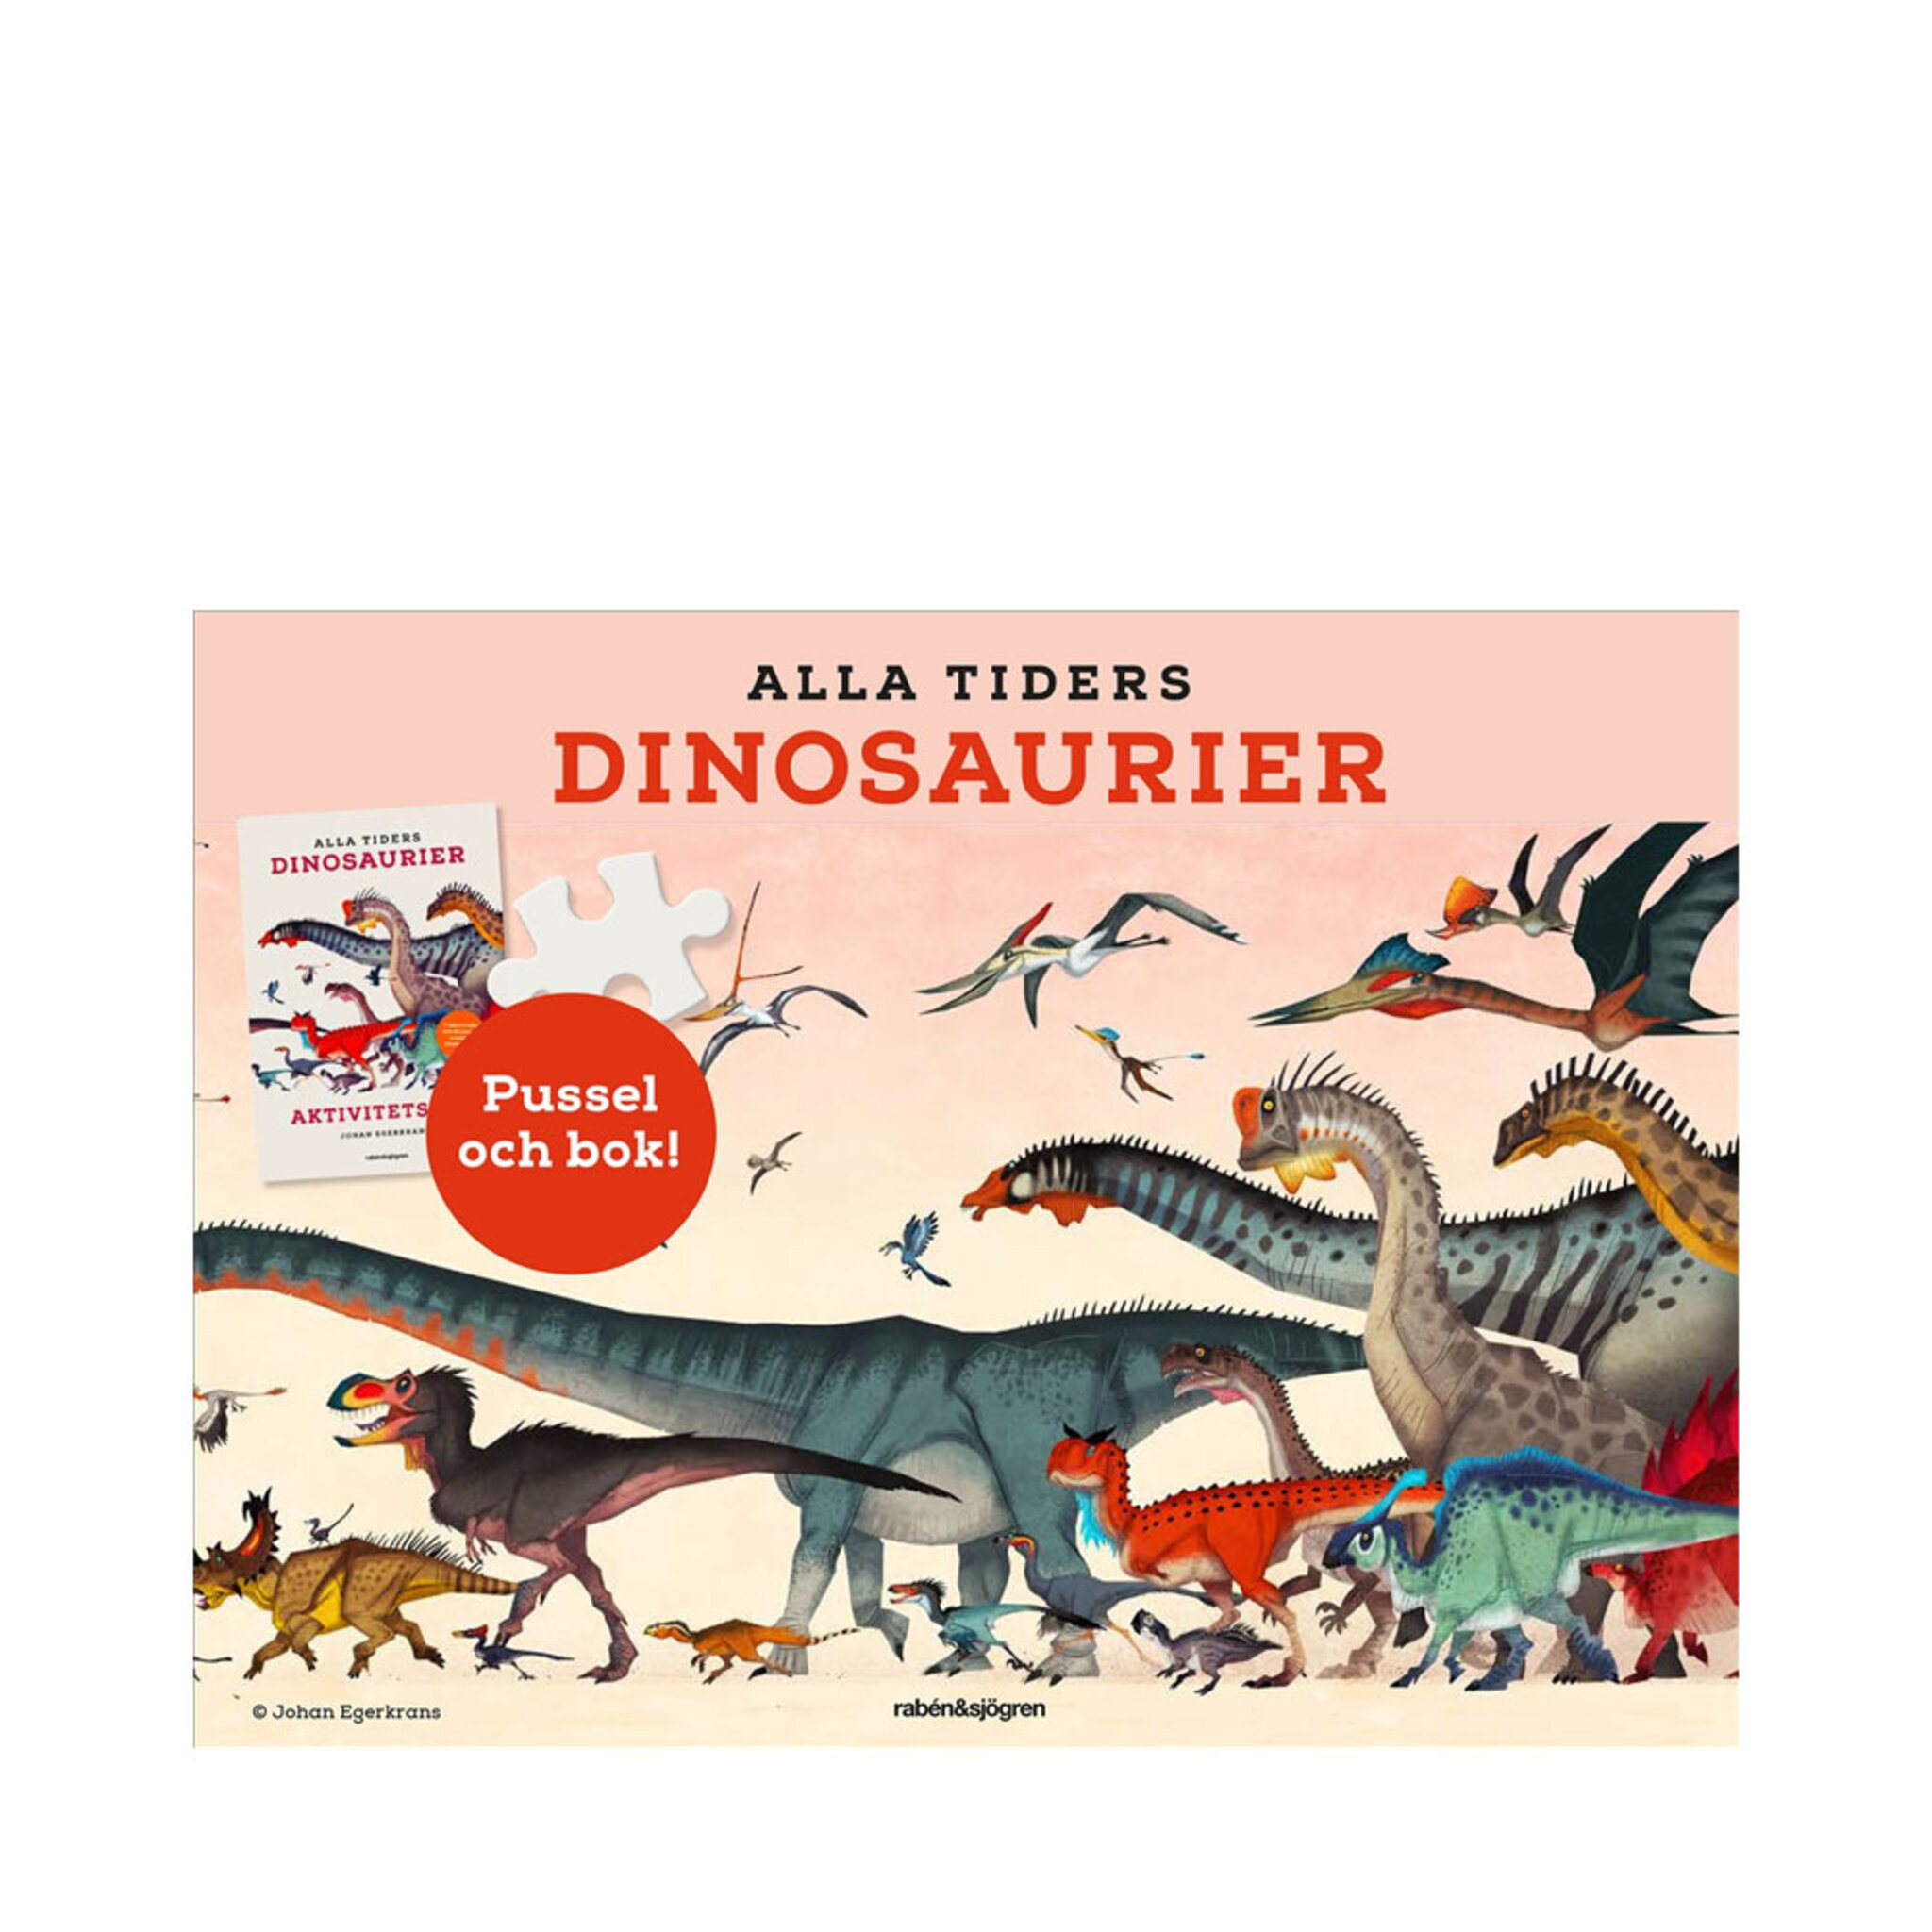 Alla tiders dinosaurier: aktivitetsbok, plansch + pussel 150 bitar